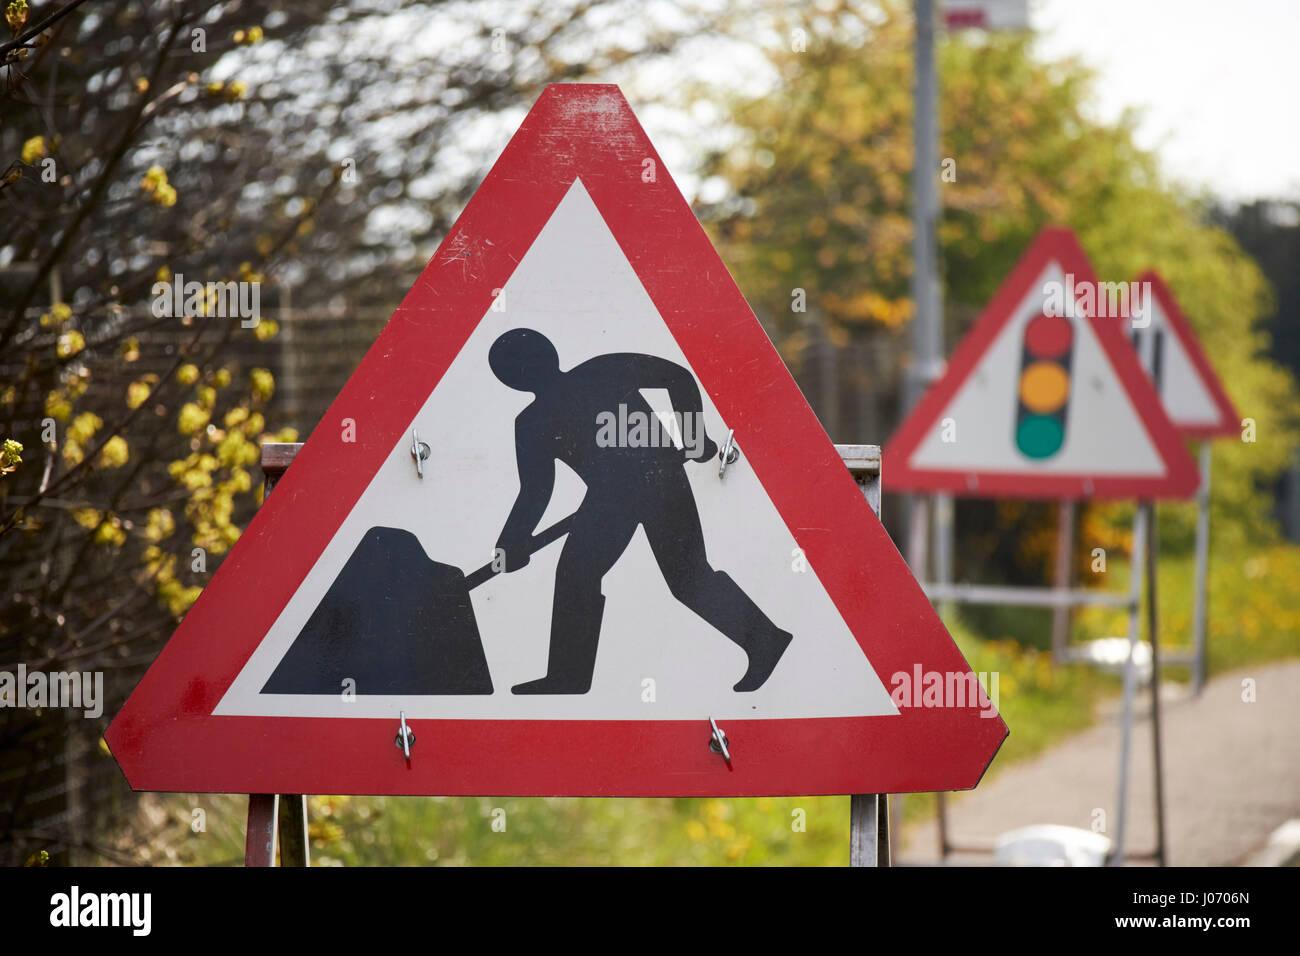 Männer in Arbeit temporären Bauens Verkehr Warnschilder in Newtownabbey UK Stockbild